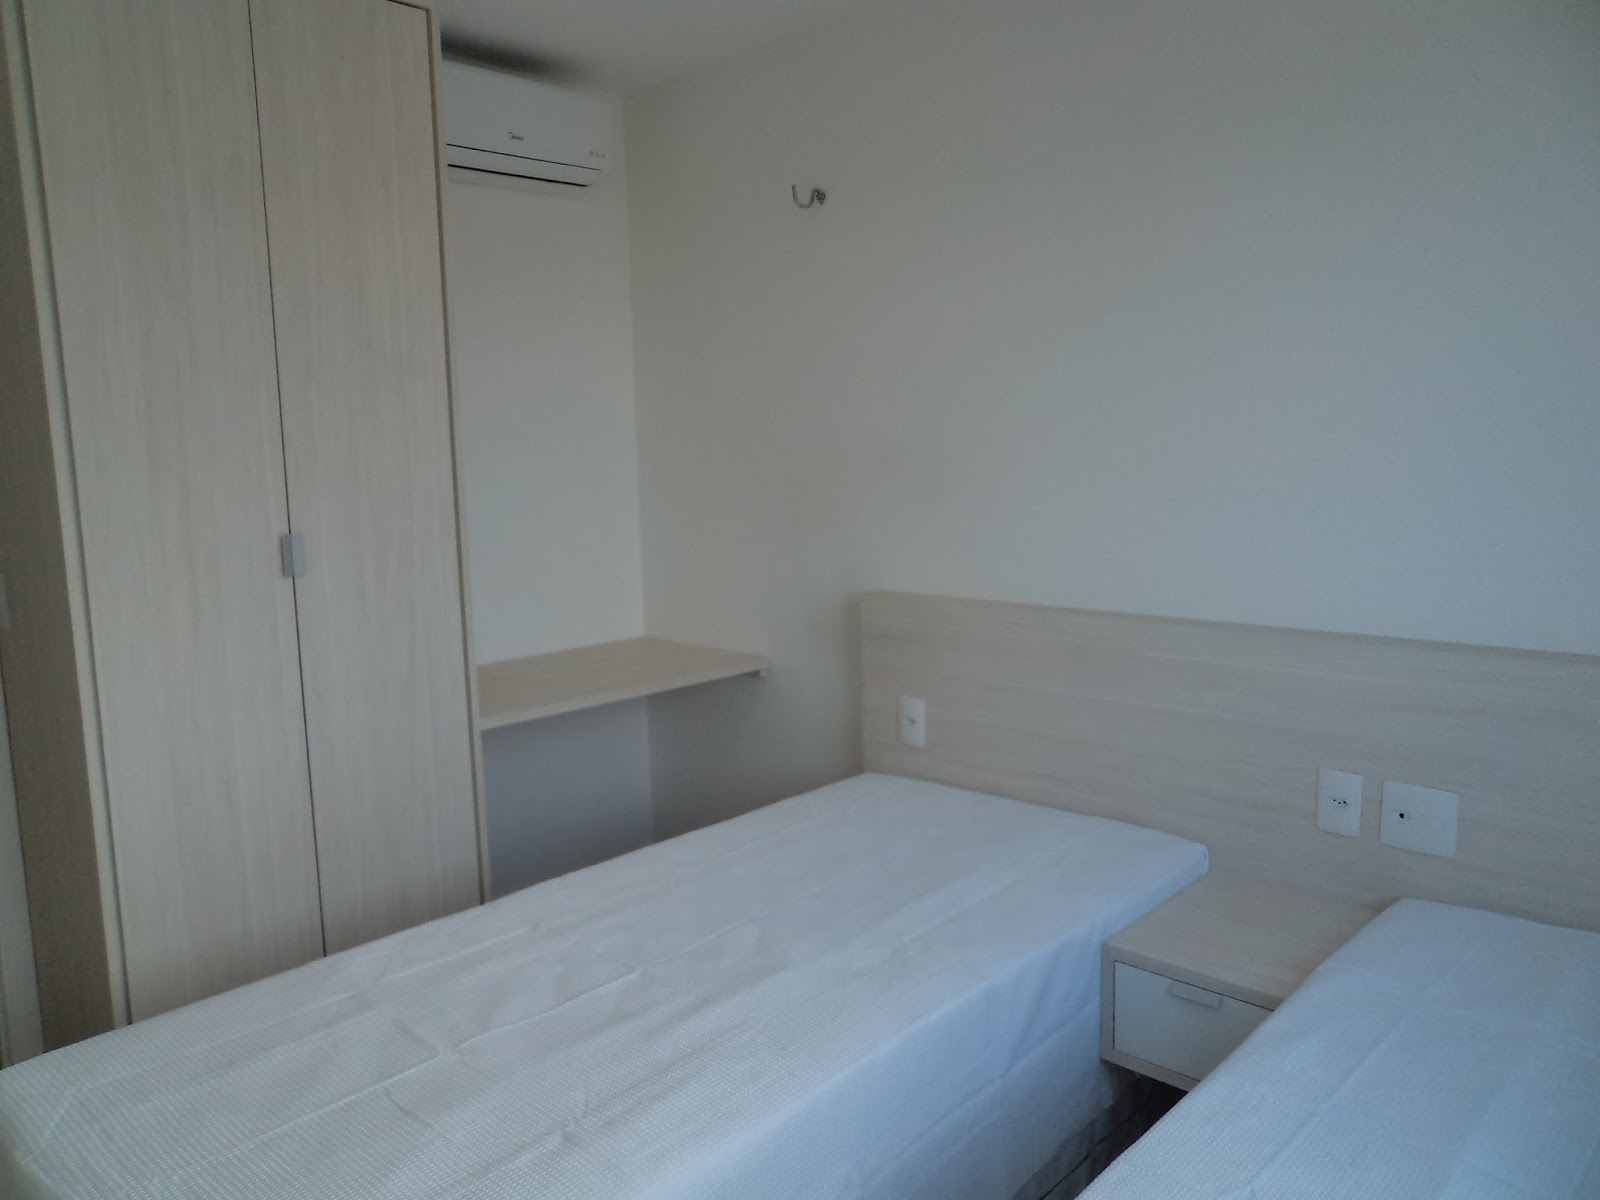 Aluguel por temporada em Fortaleza: APARTAMENTO NA PRAIA DO FUTURO  #4D677E 1600x1200 Banheiro Container Fortaleza